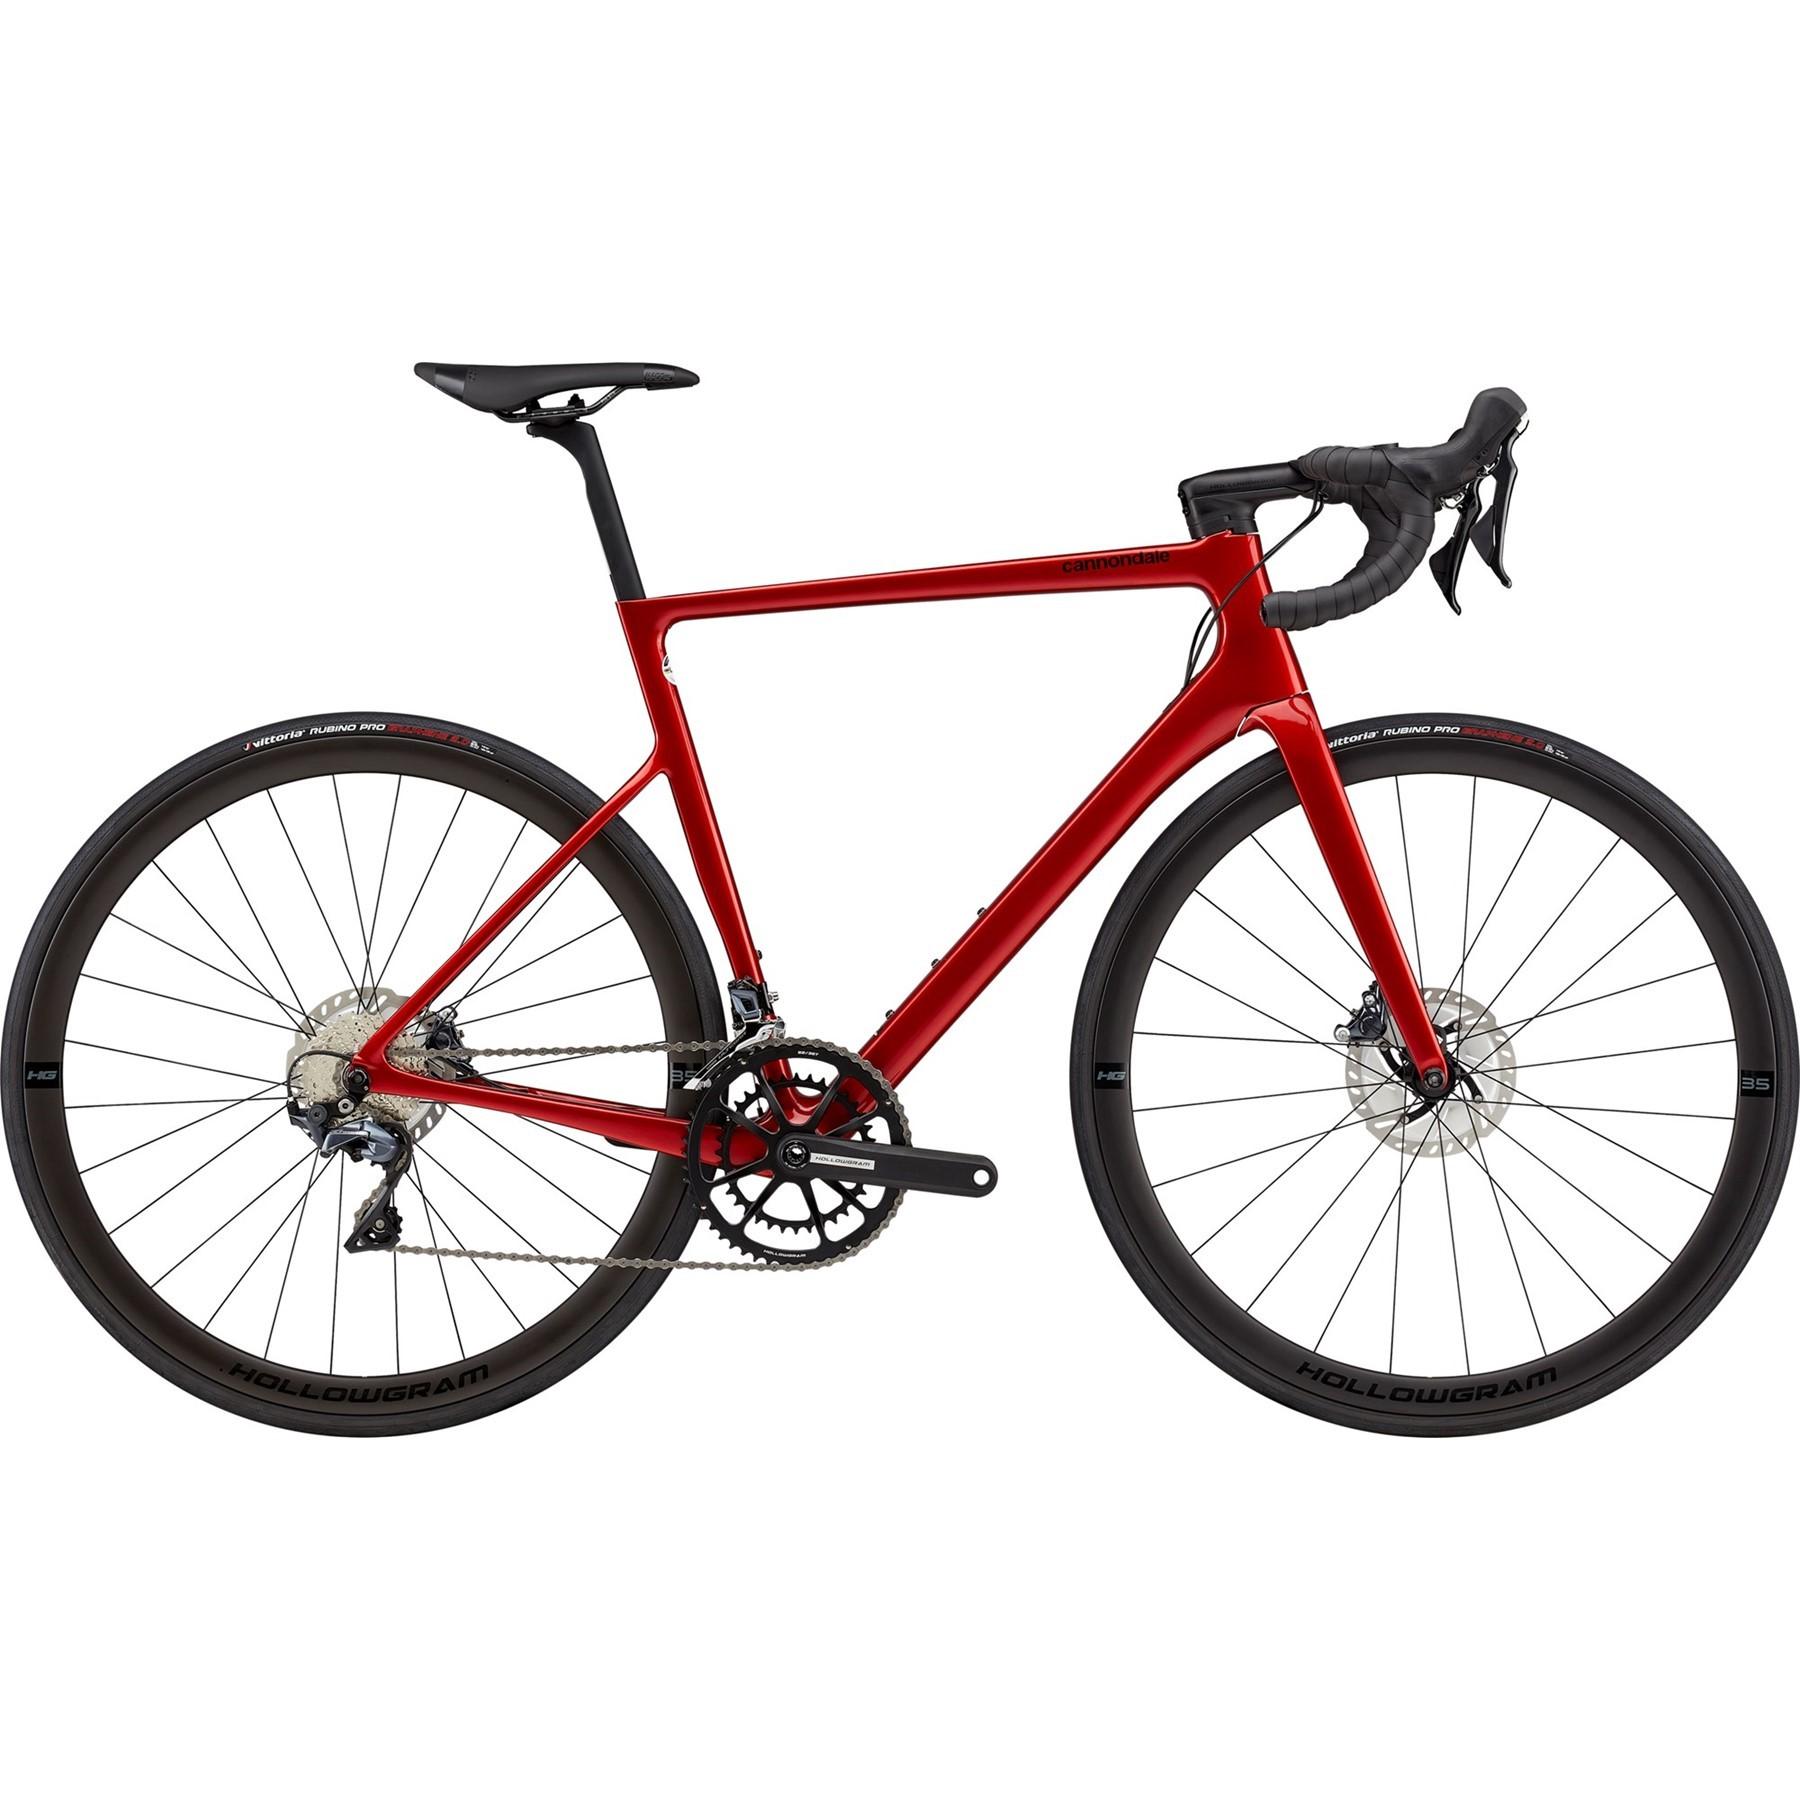 Cannondale SuperSix EVO Hi Mod Ultegra Disc Road Bike 2021 Candy Red